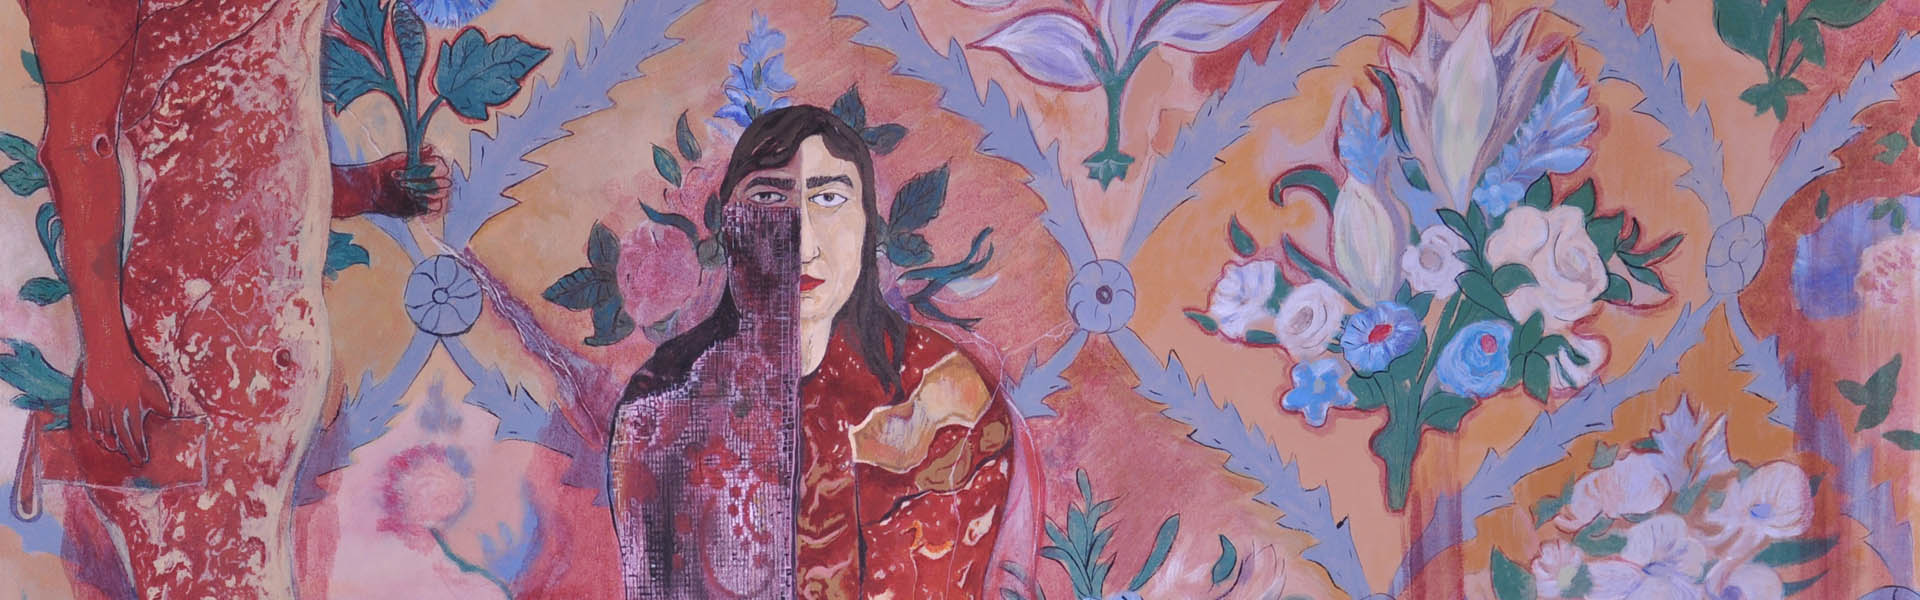 zahra barahimi painting exhibition didar gallery silani paint art زهرا براهیمی نمایشگاه نقاشی دیدار گالری سیلانی هنر